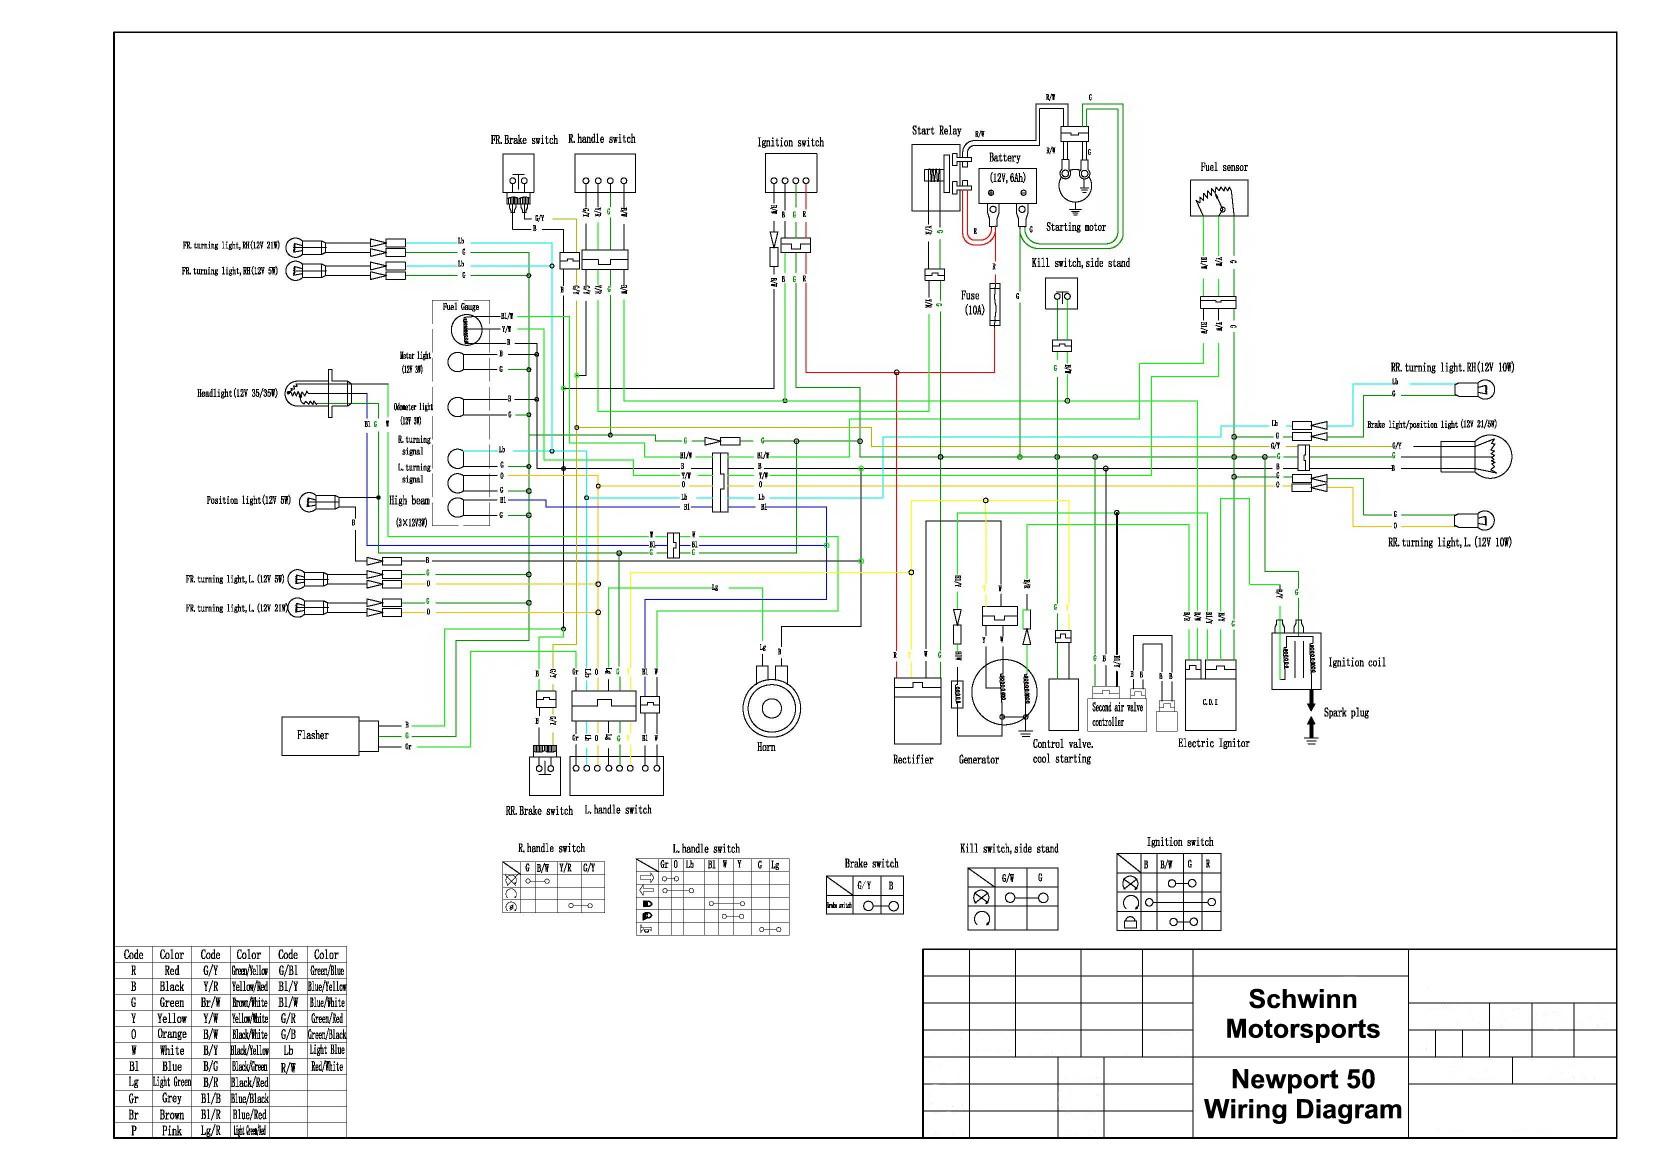 Honda 50 Cdi Diagram - Wiring Diagrams Hubs - Scooter Ignition Wiring Diagram